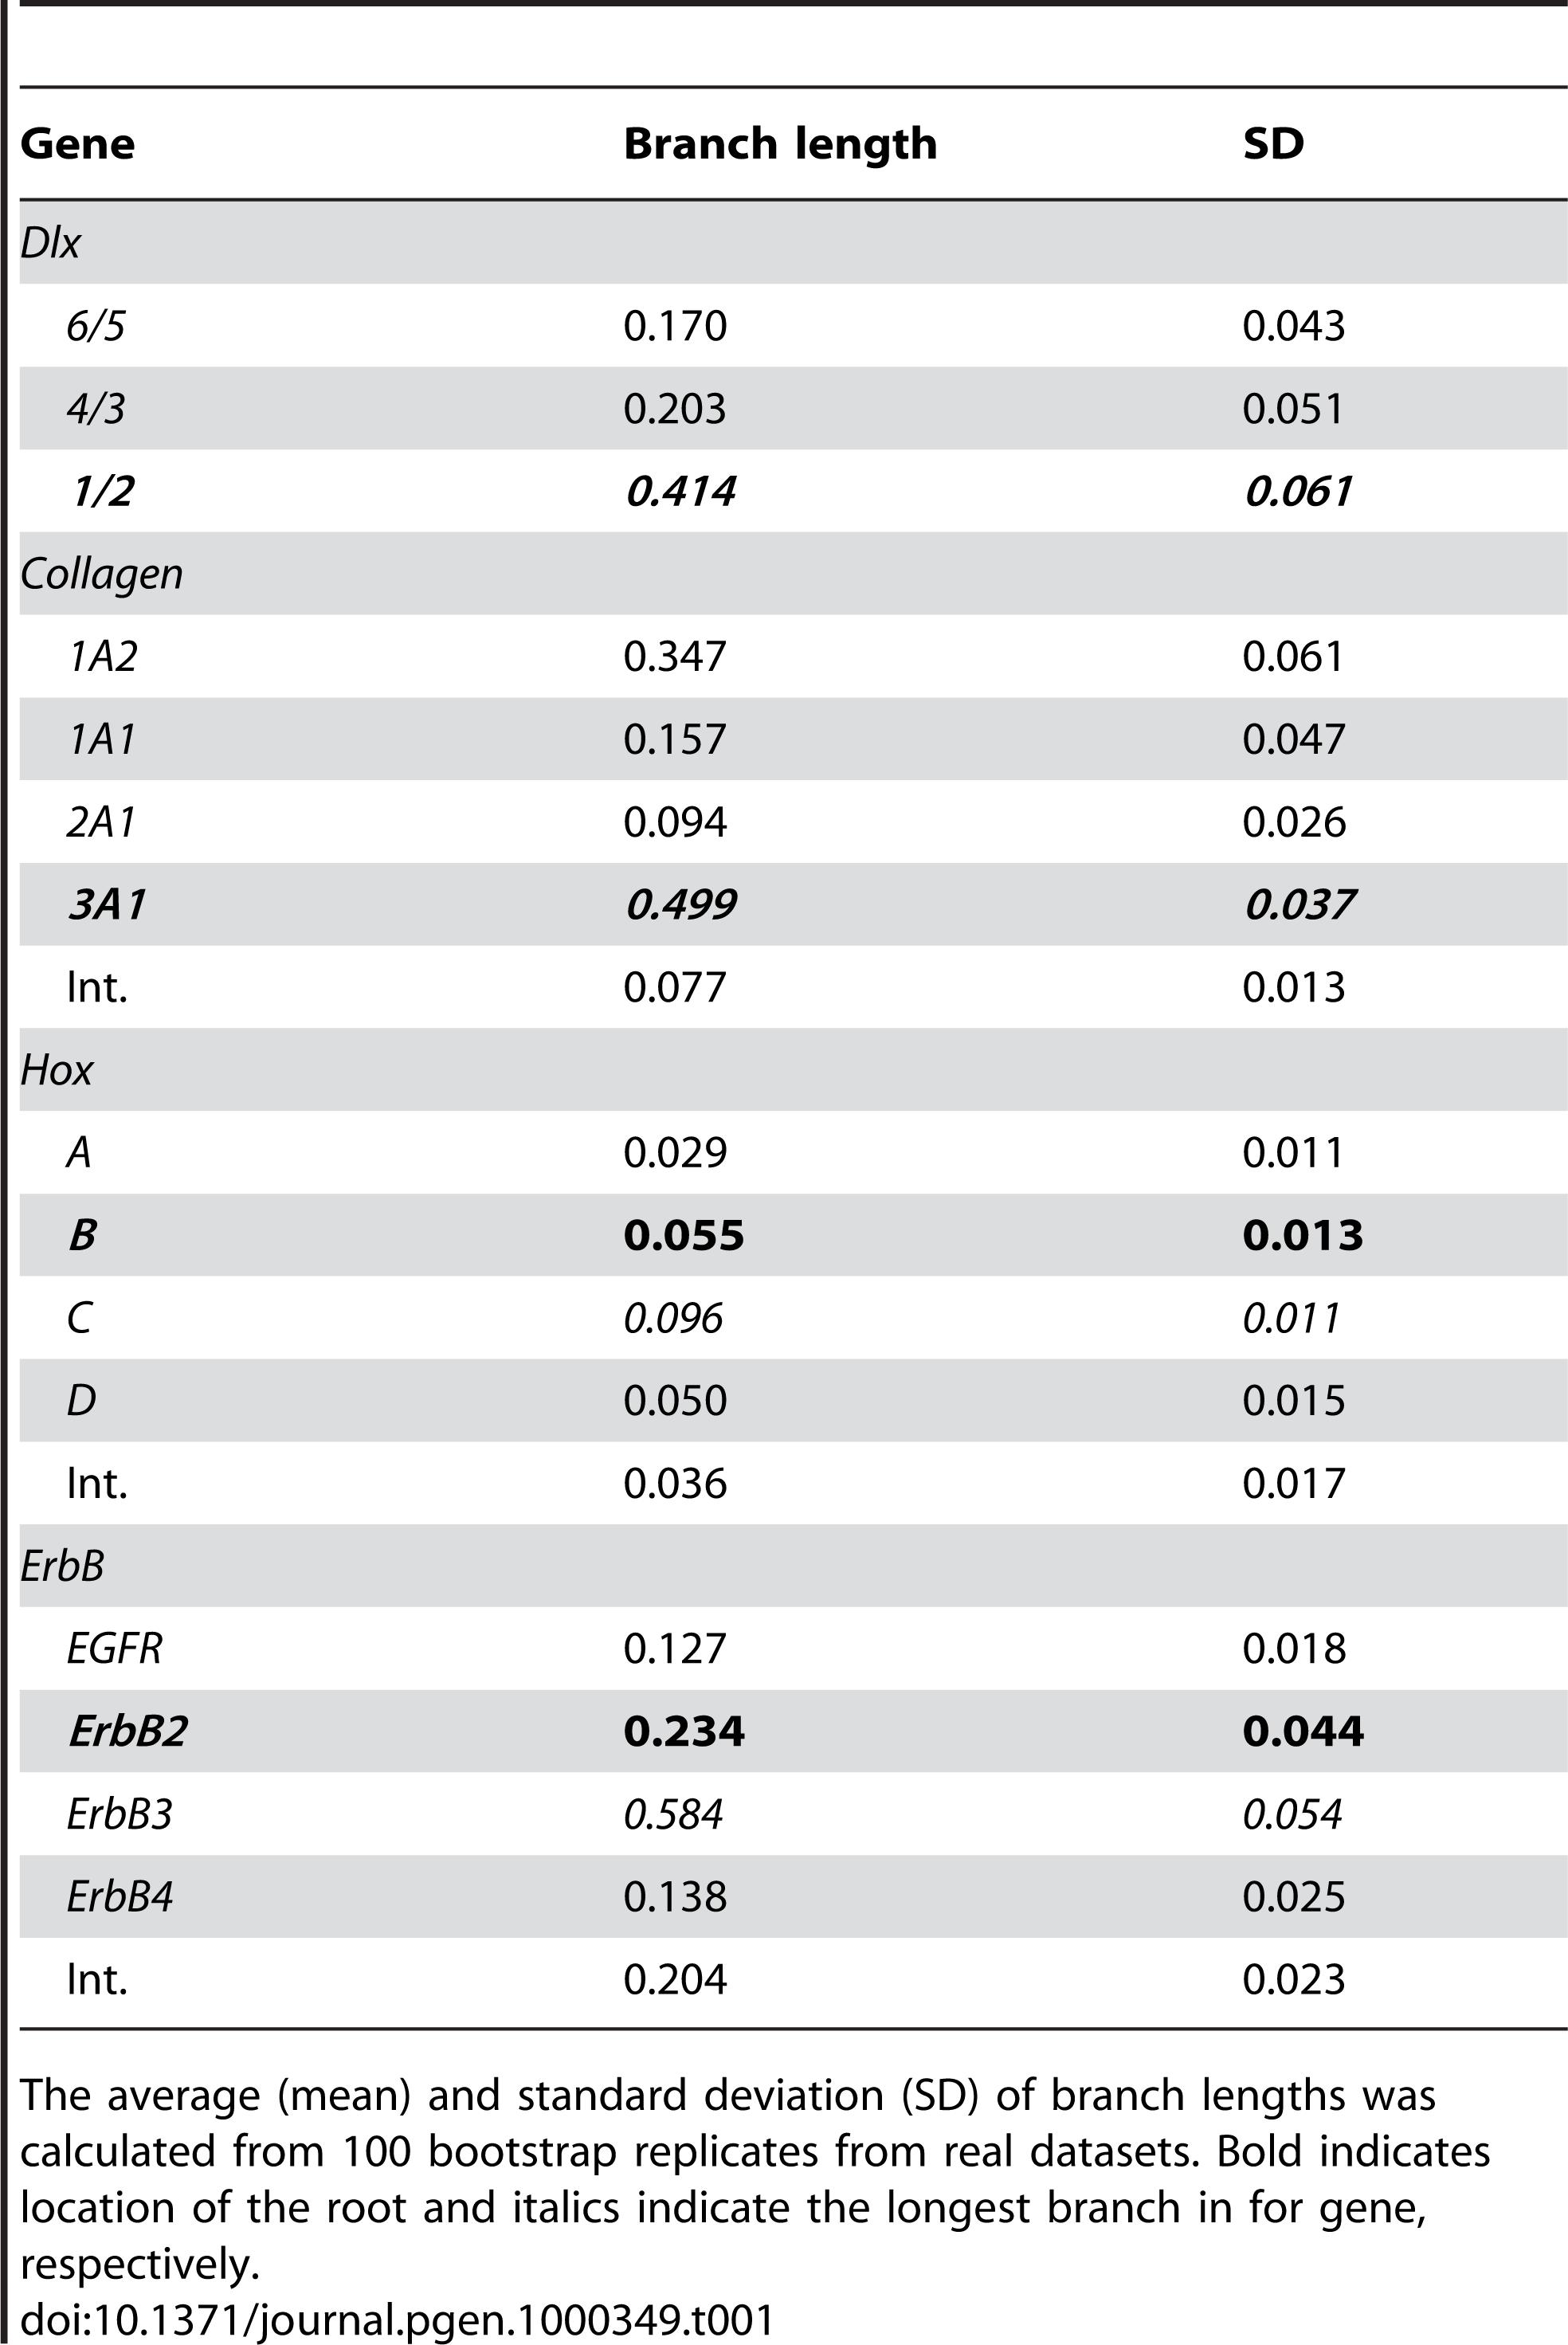 Branch length data for the stem of <i>Dlx</i>, <i>Col</i>, <i>Hox</i> and <i>ErbB</i> clusters.